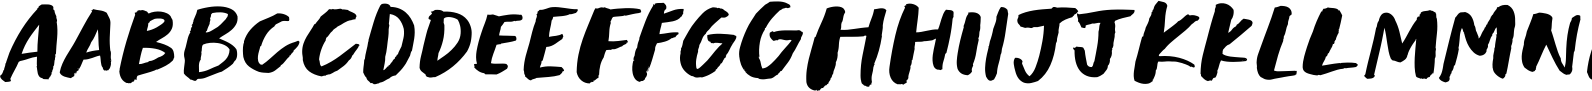 Foxglove SVG